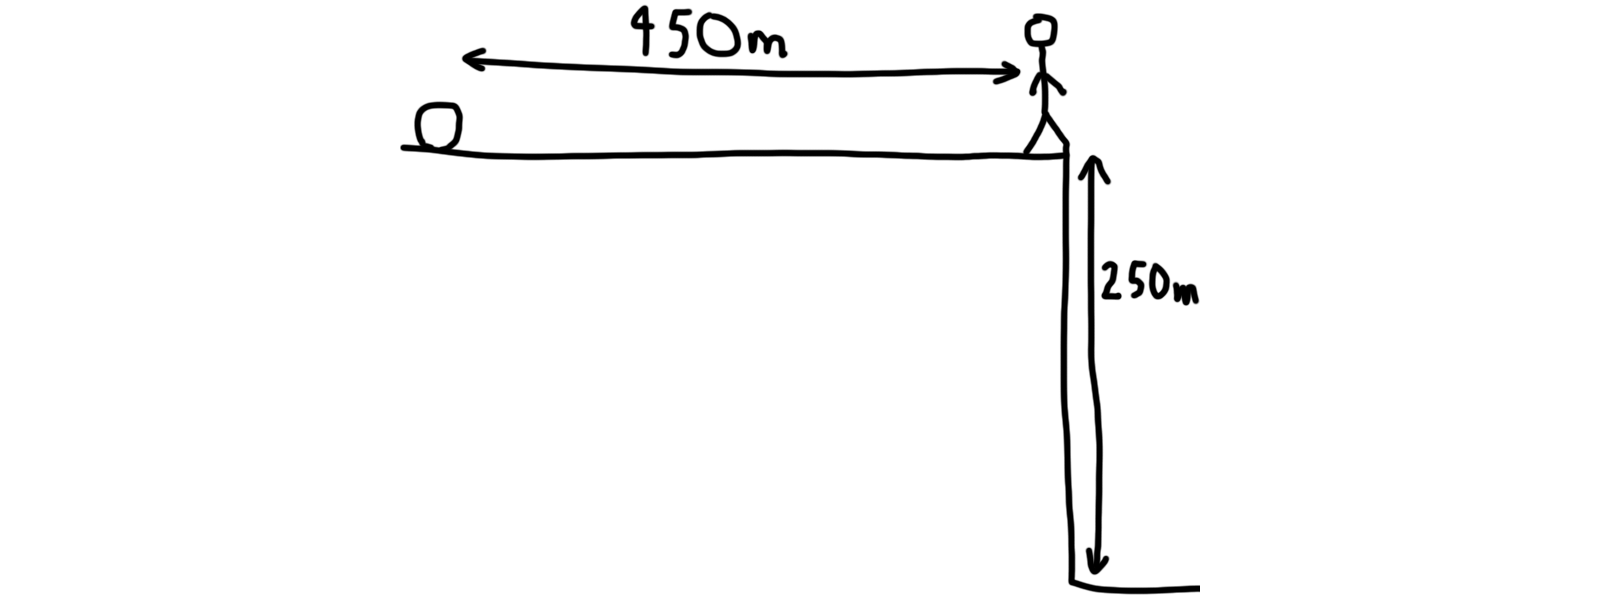 Trig drawing 1